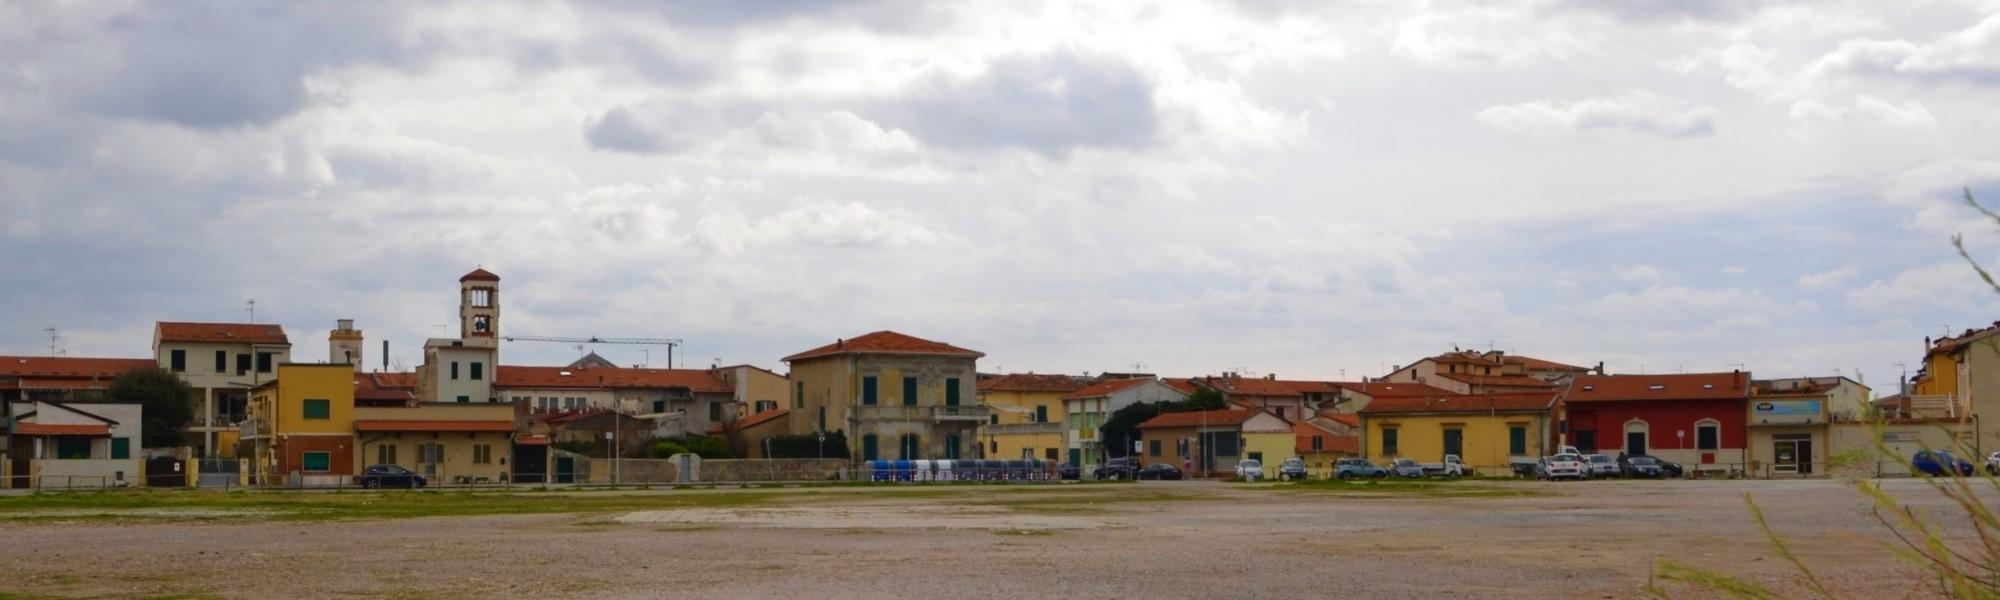 Piazza Viviani, Marina di Pisa (L. Corevi, Comune di Pisa)